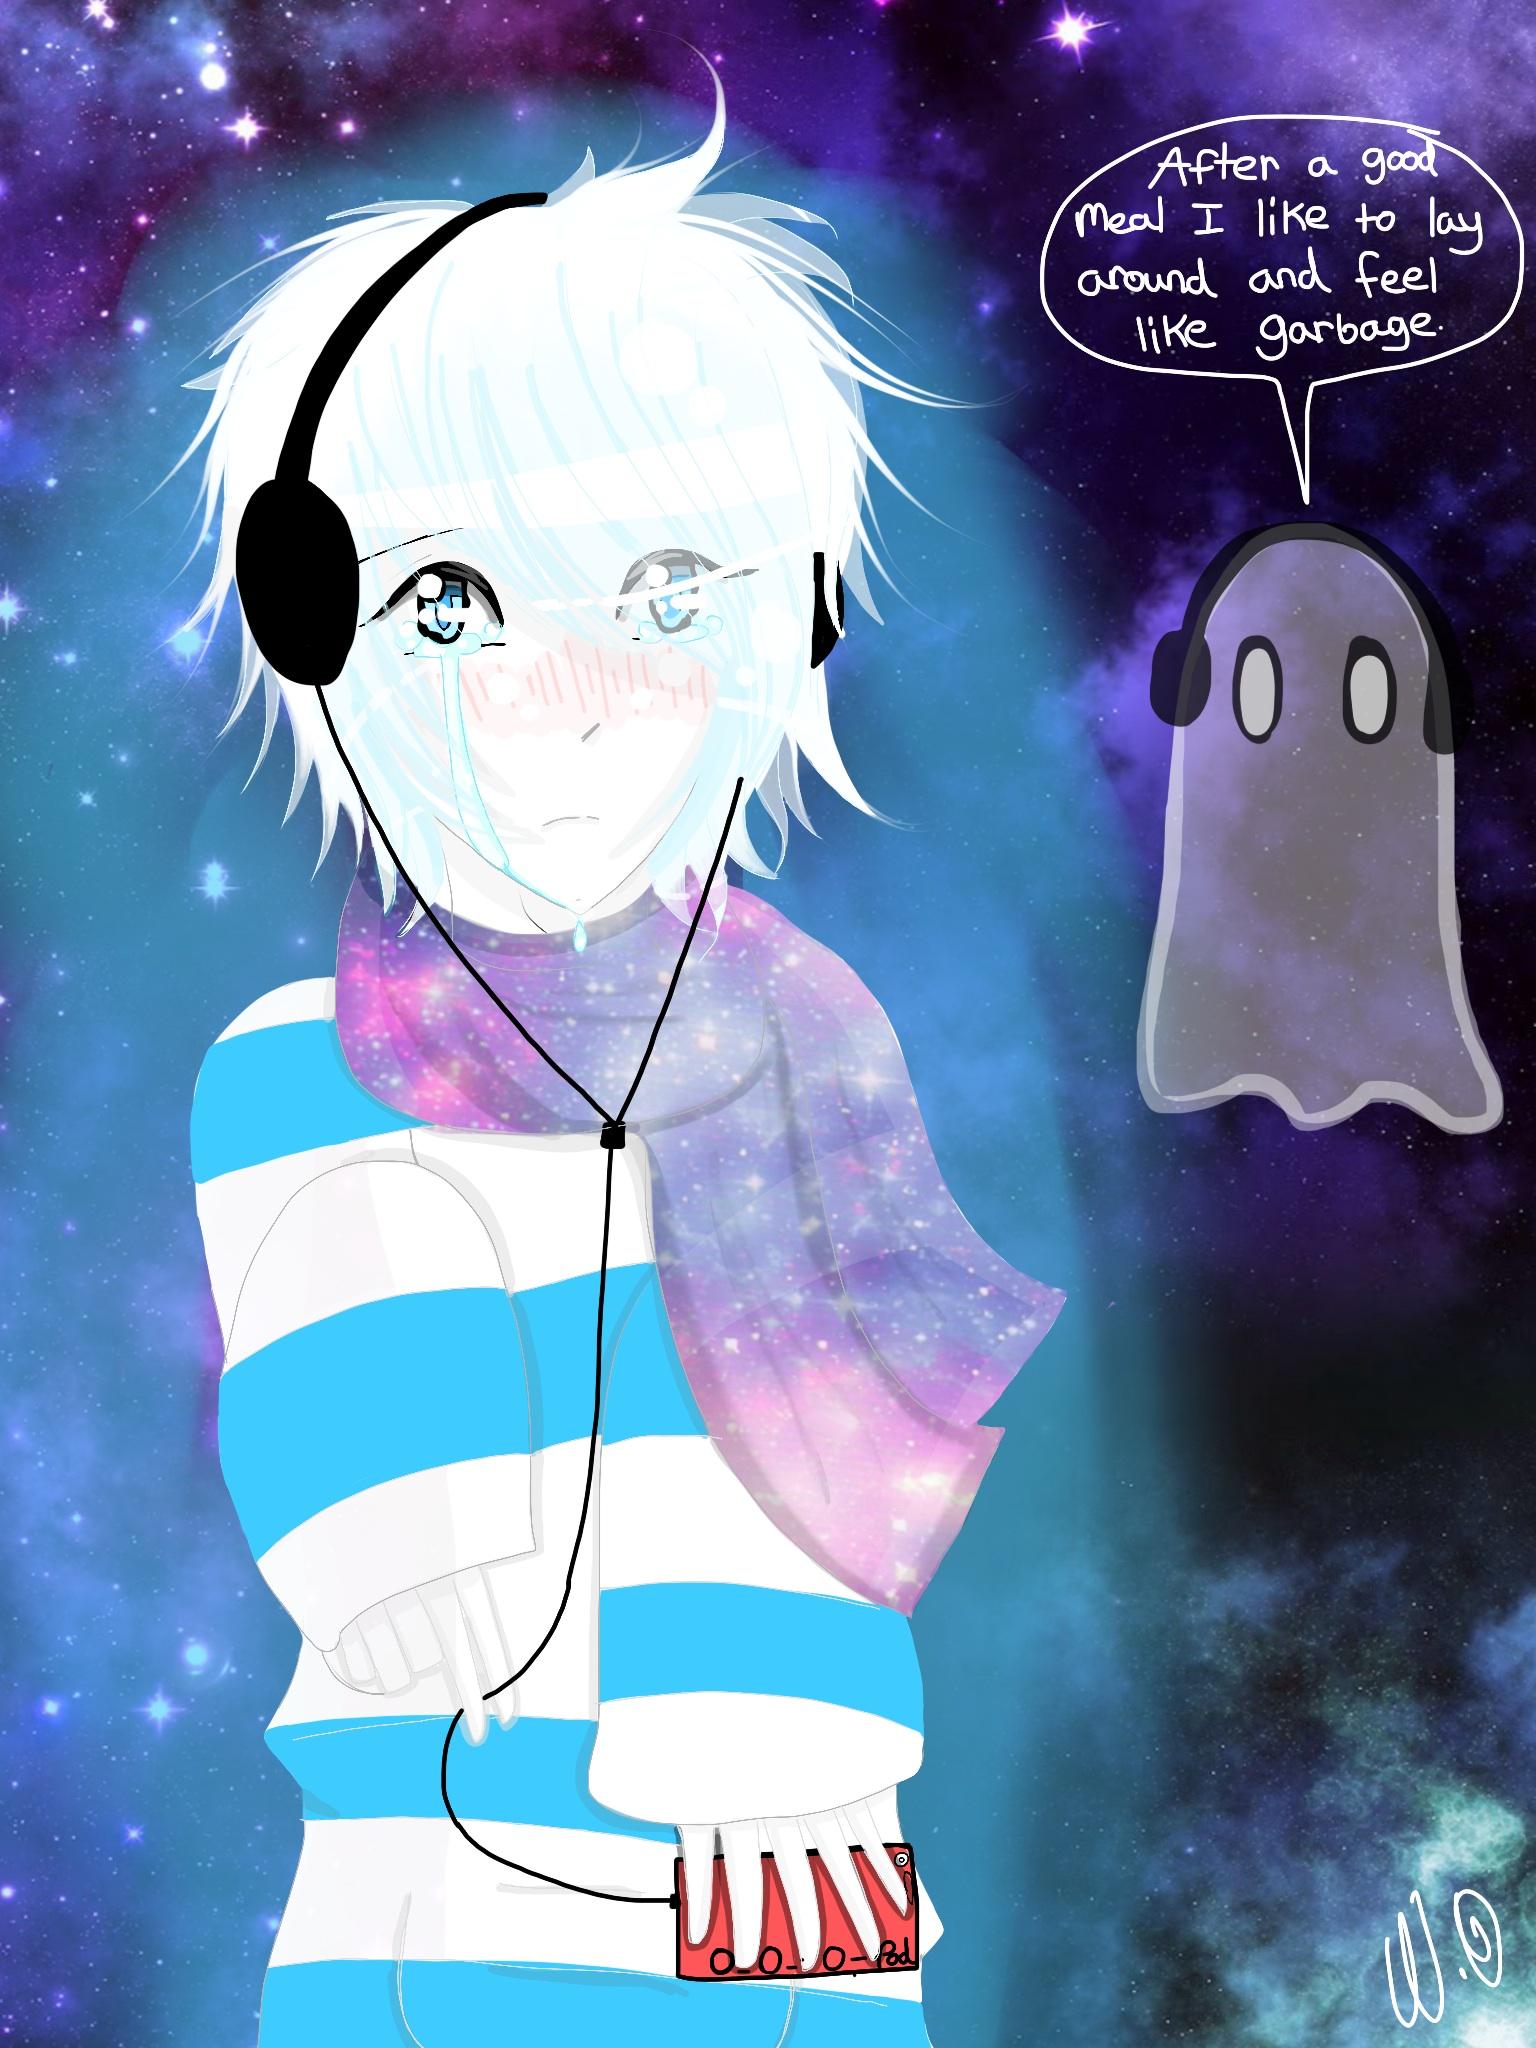 Undertale Napstablook by Neon Gloom 1536x2048